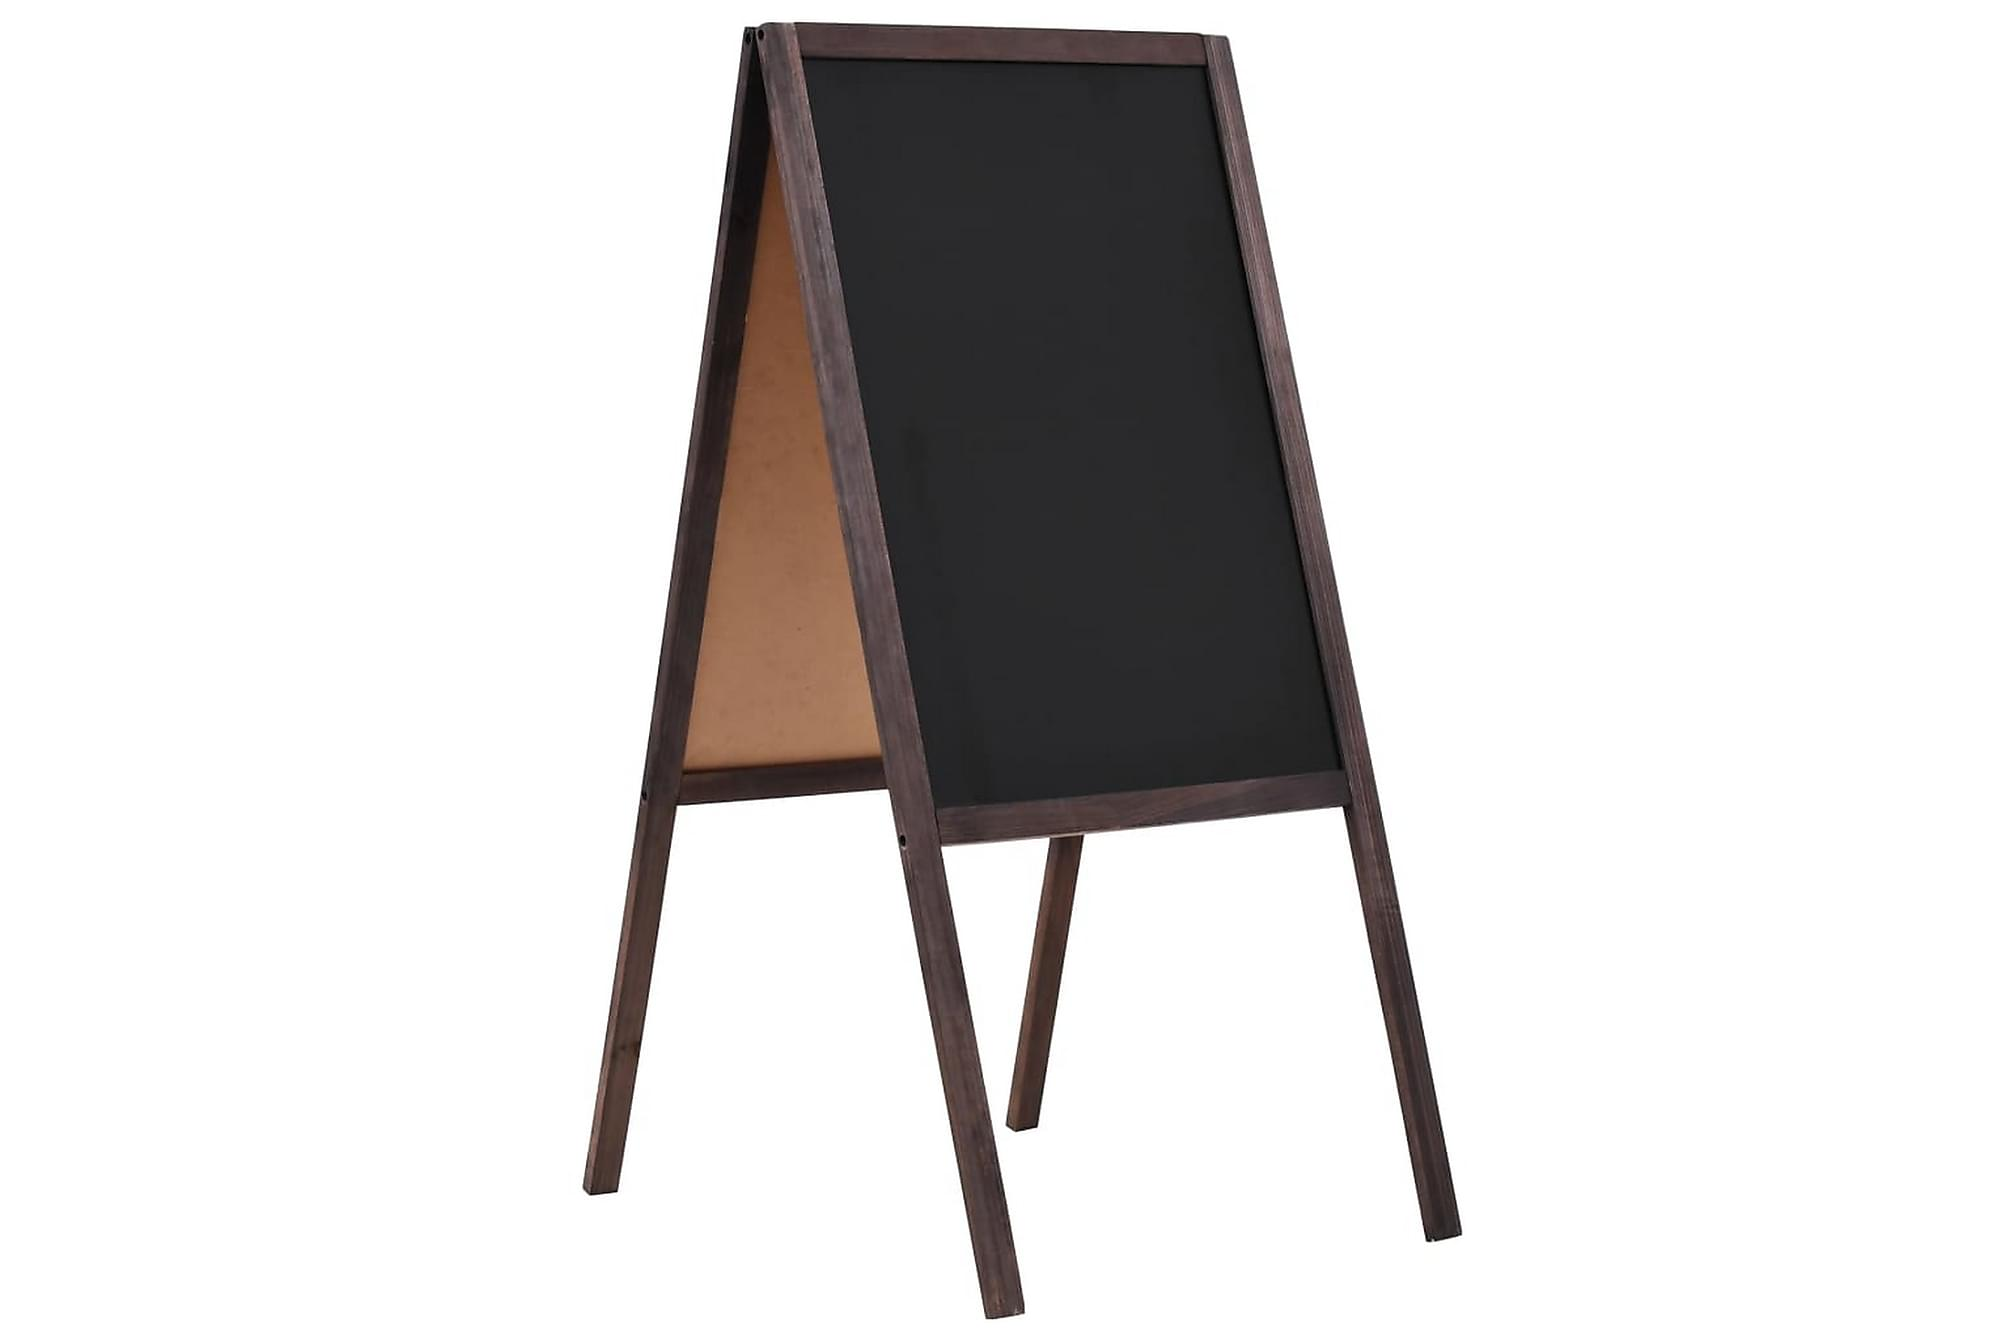 Griffeltavla dubbelsidig cedarträ fristående 40x60 cm, Whiteboards & griffeltavlor